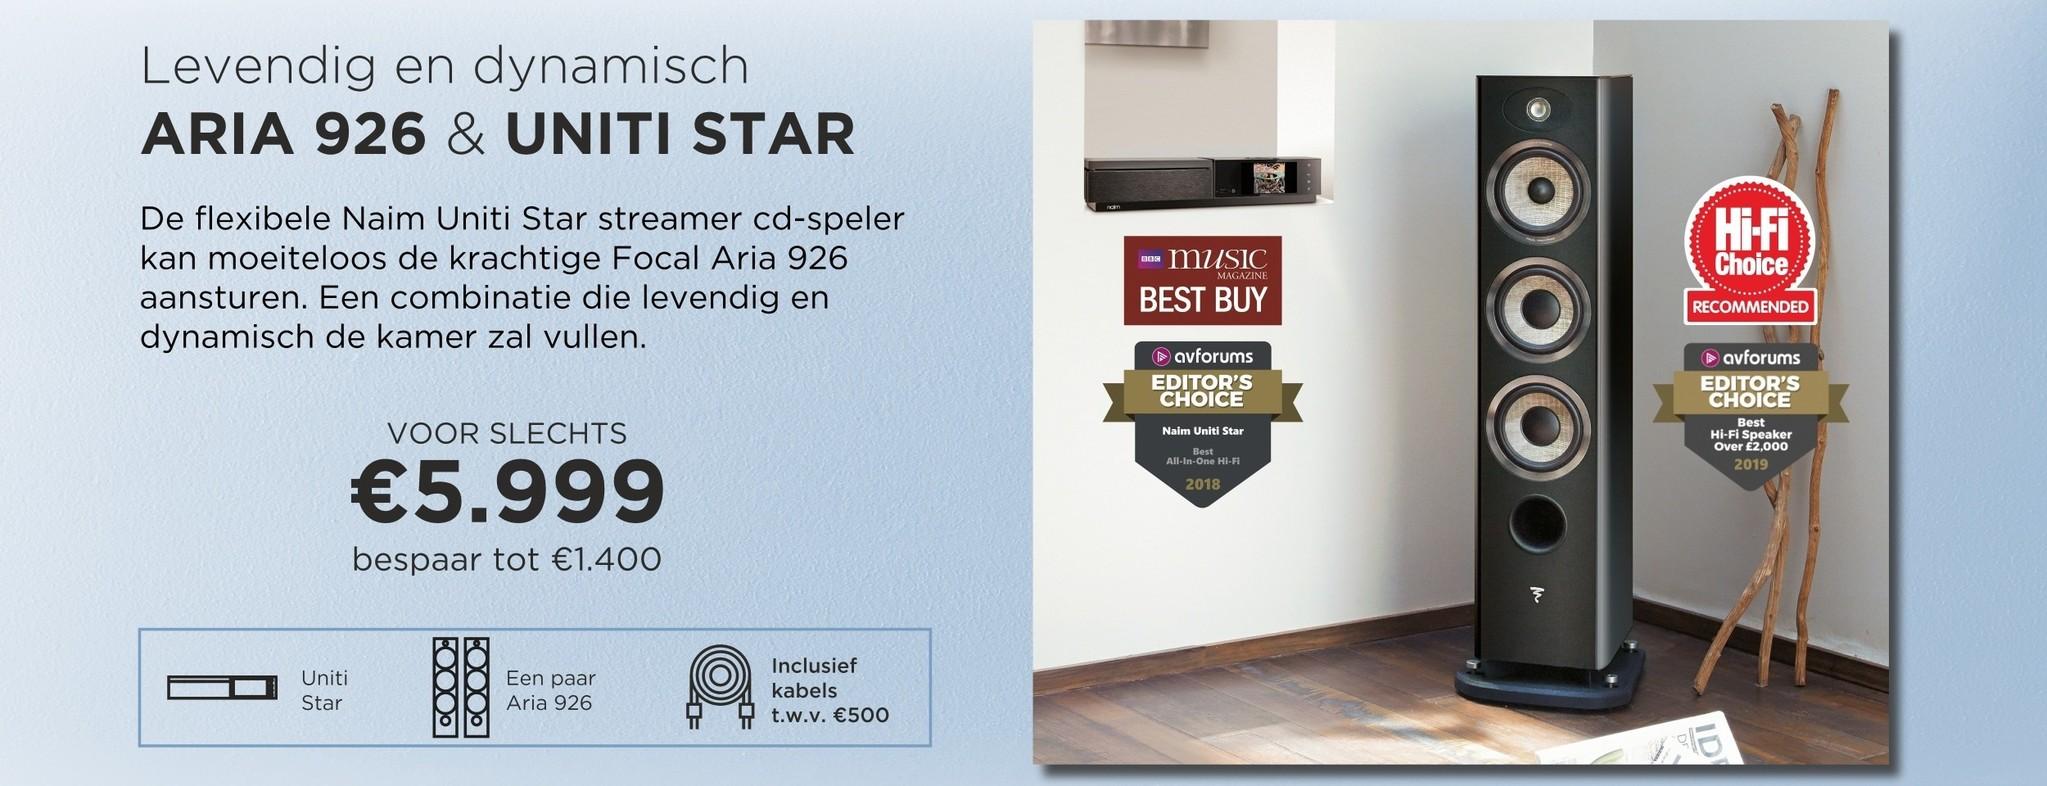 Aria 926 & Uniti Star